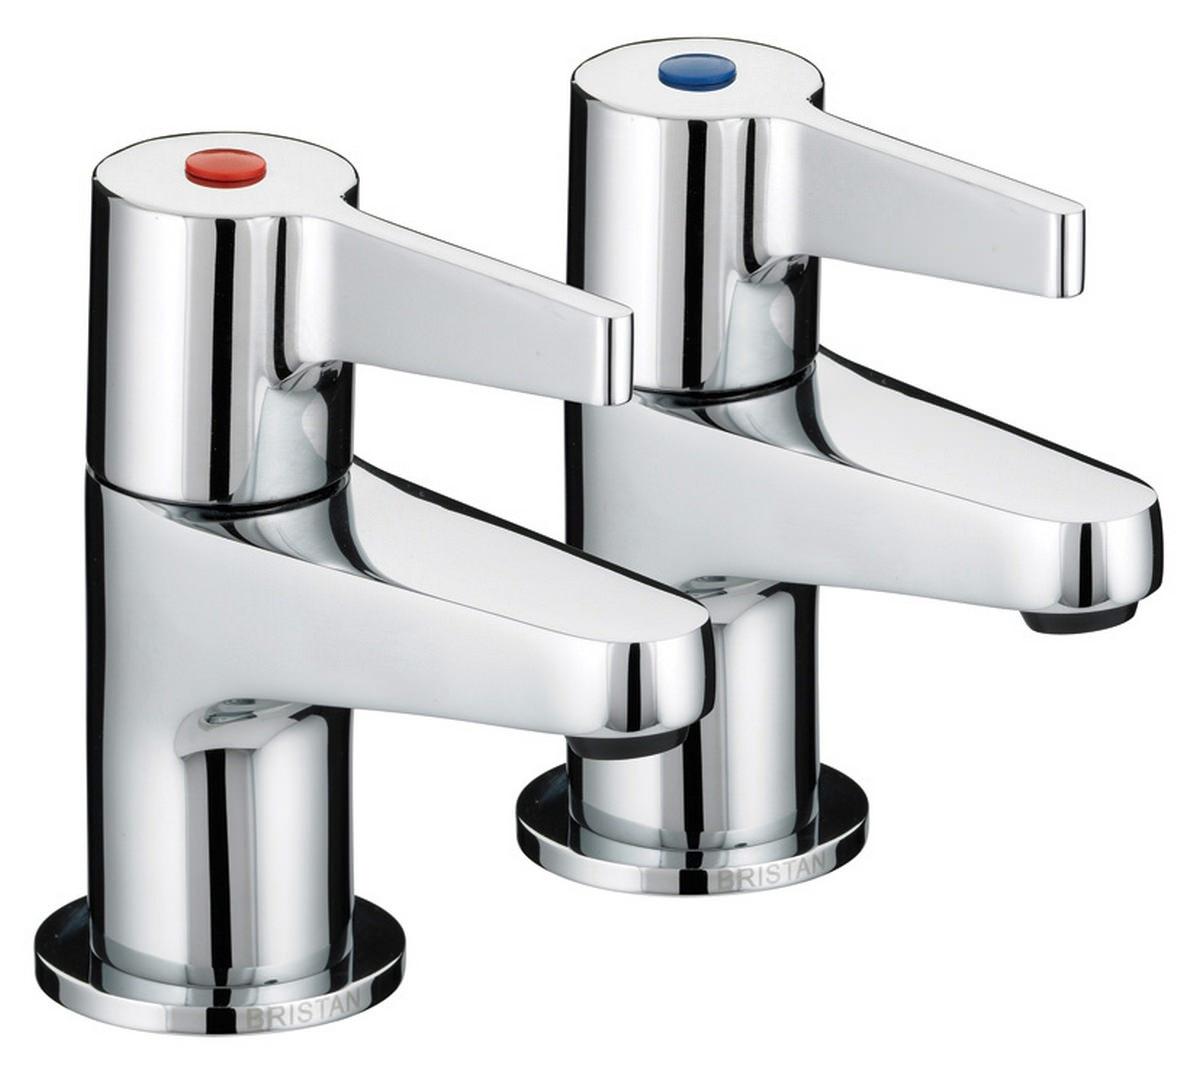 Bristan design utility lever 3 4 bath taps dul 3 4 c for 3 4 bath